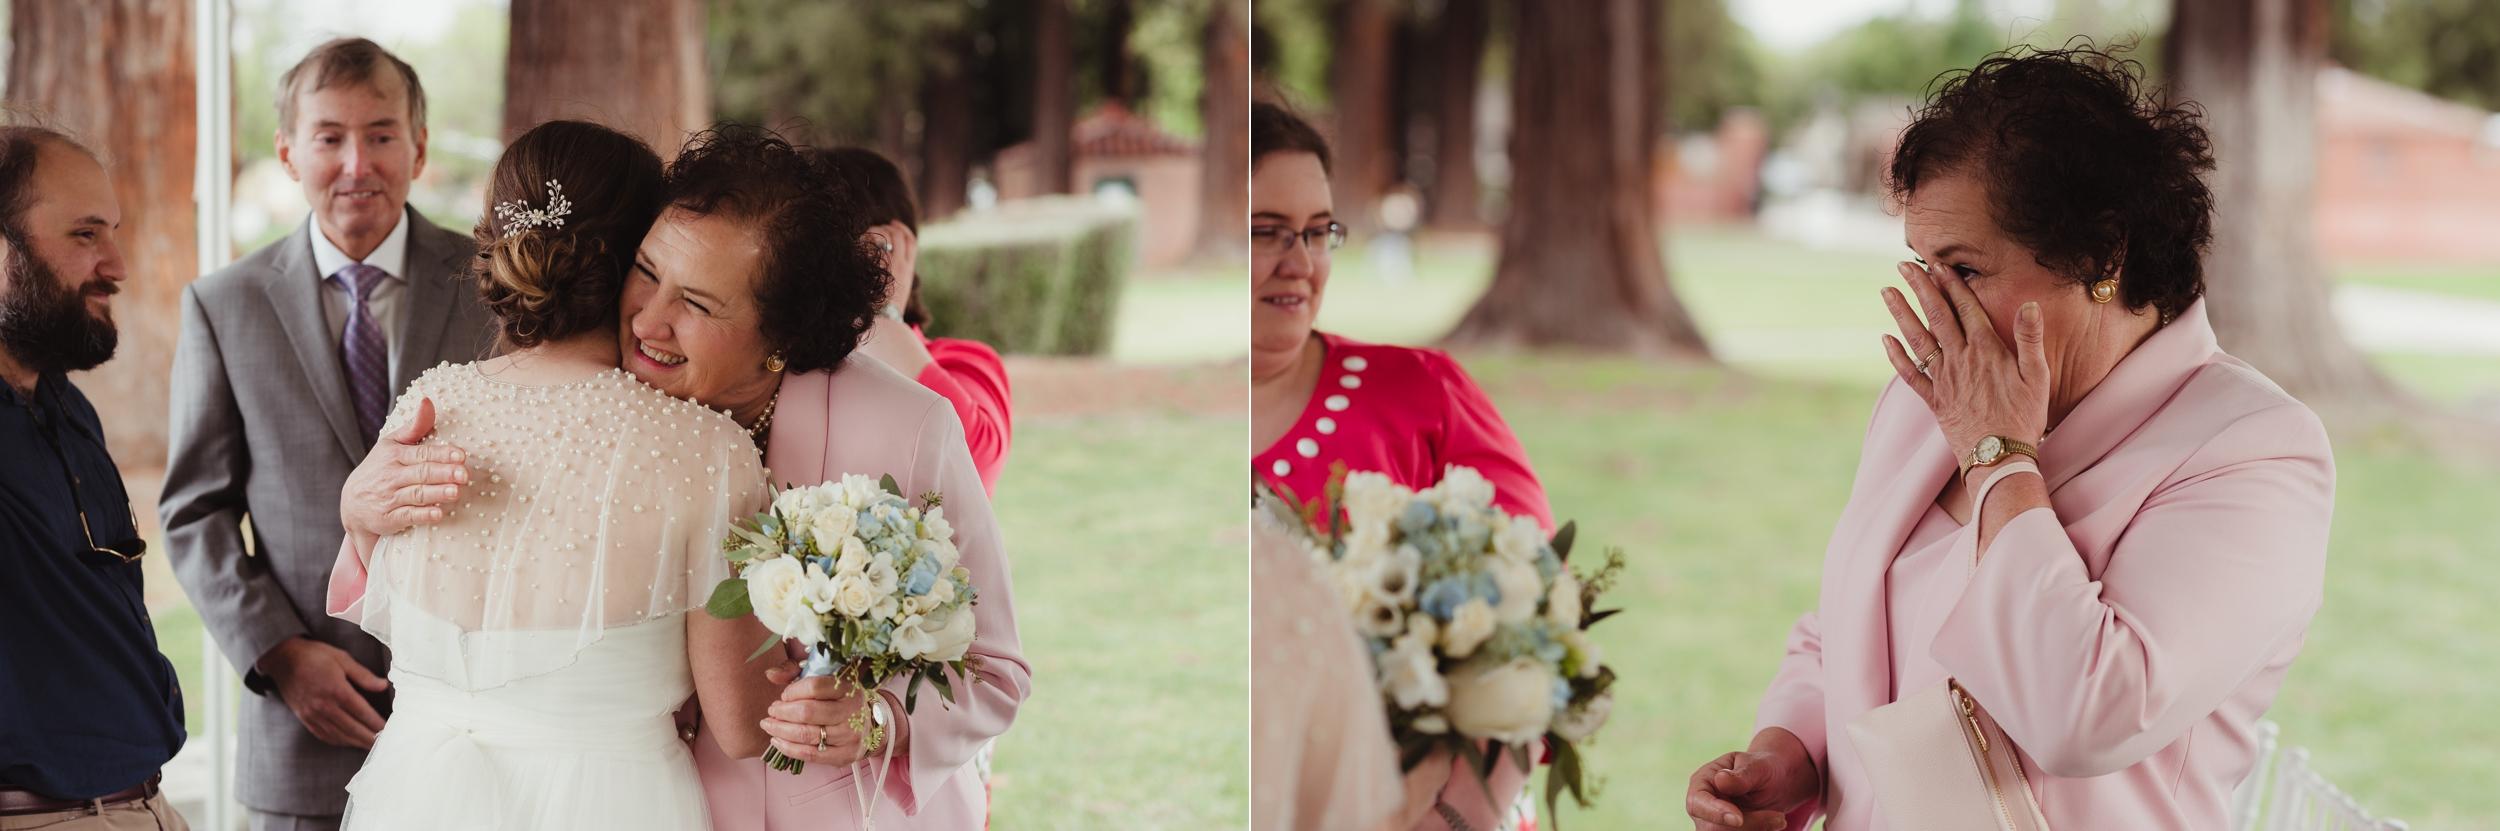 27-san-jose-rose-garden-wedding-vivianchen-299_WEB.jpg